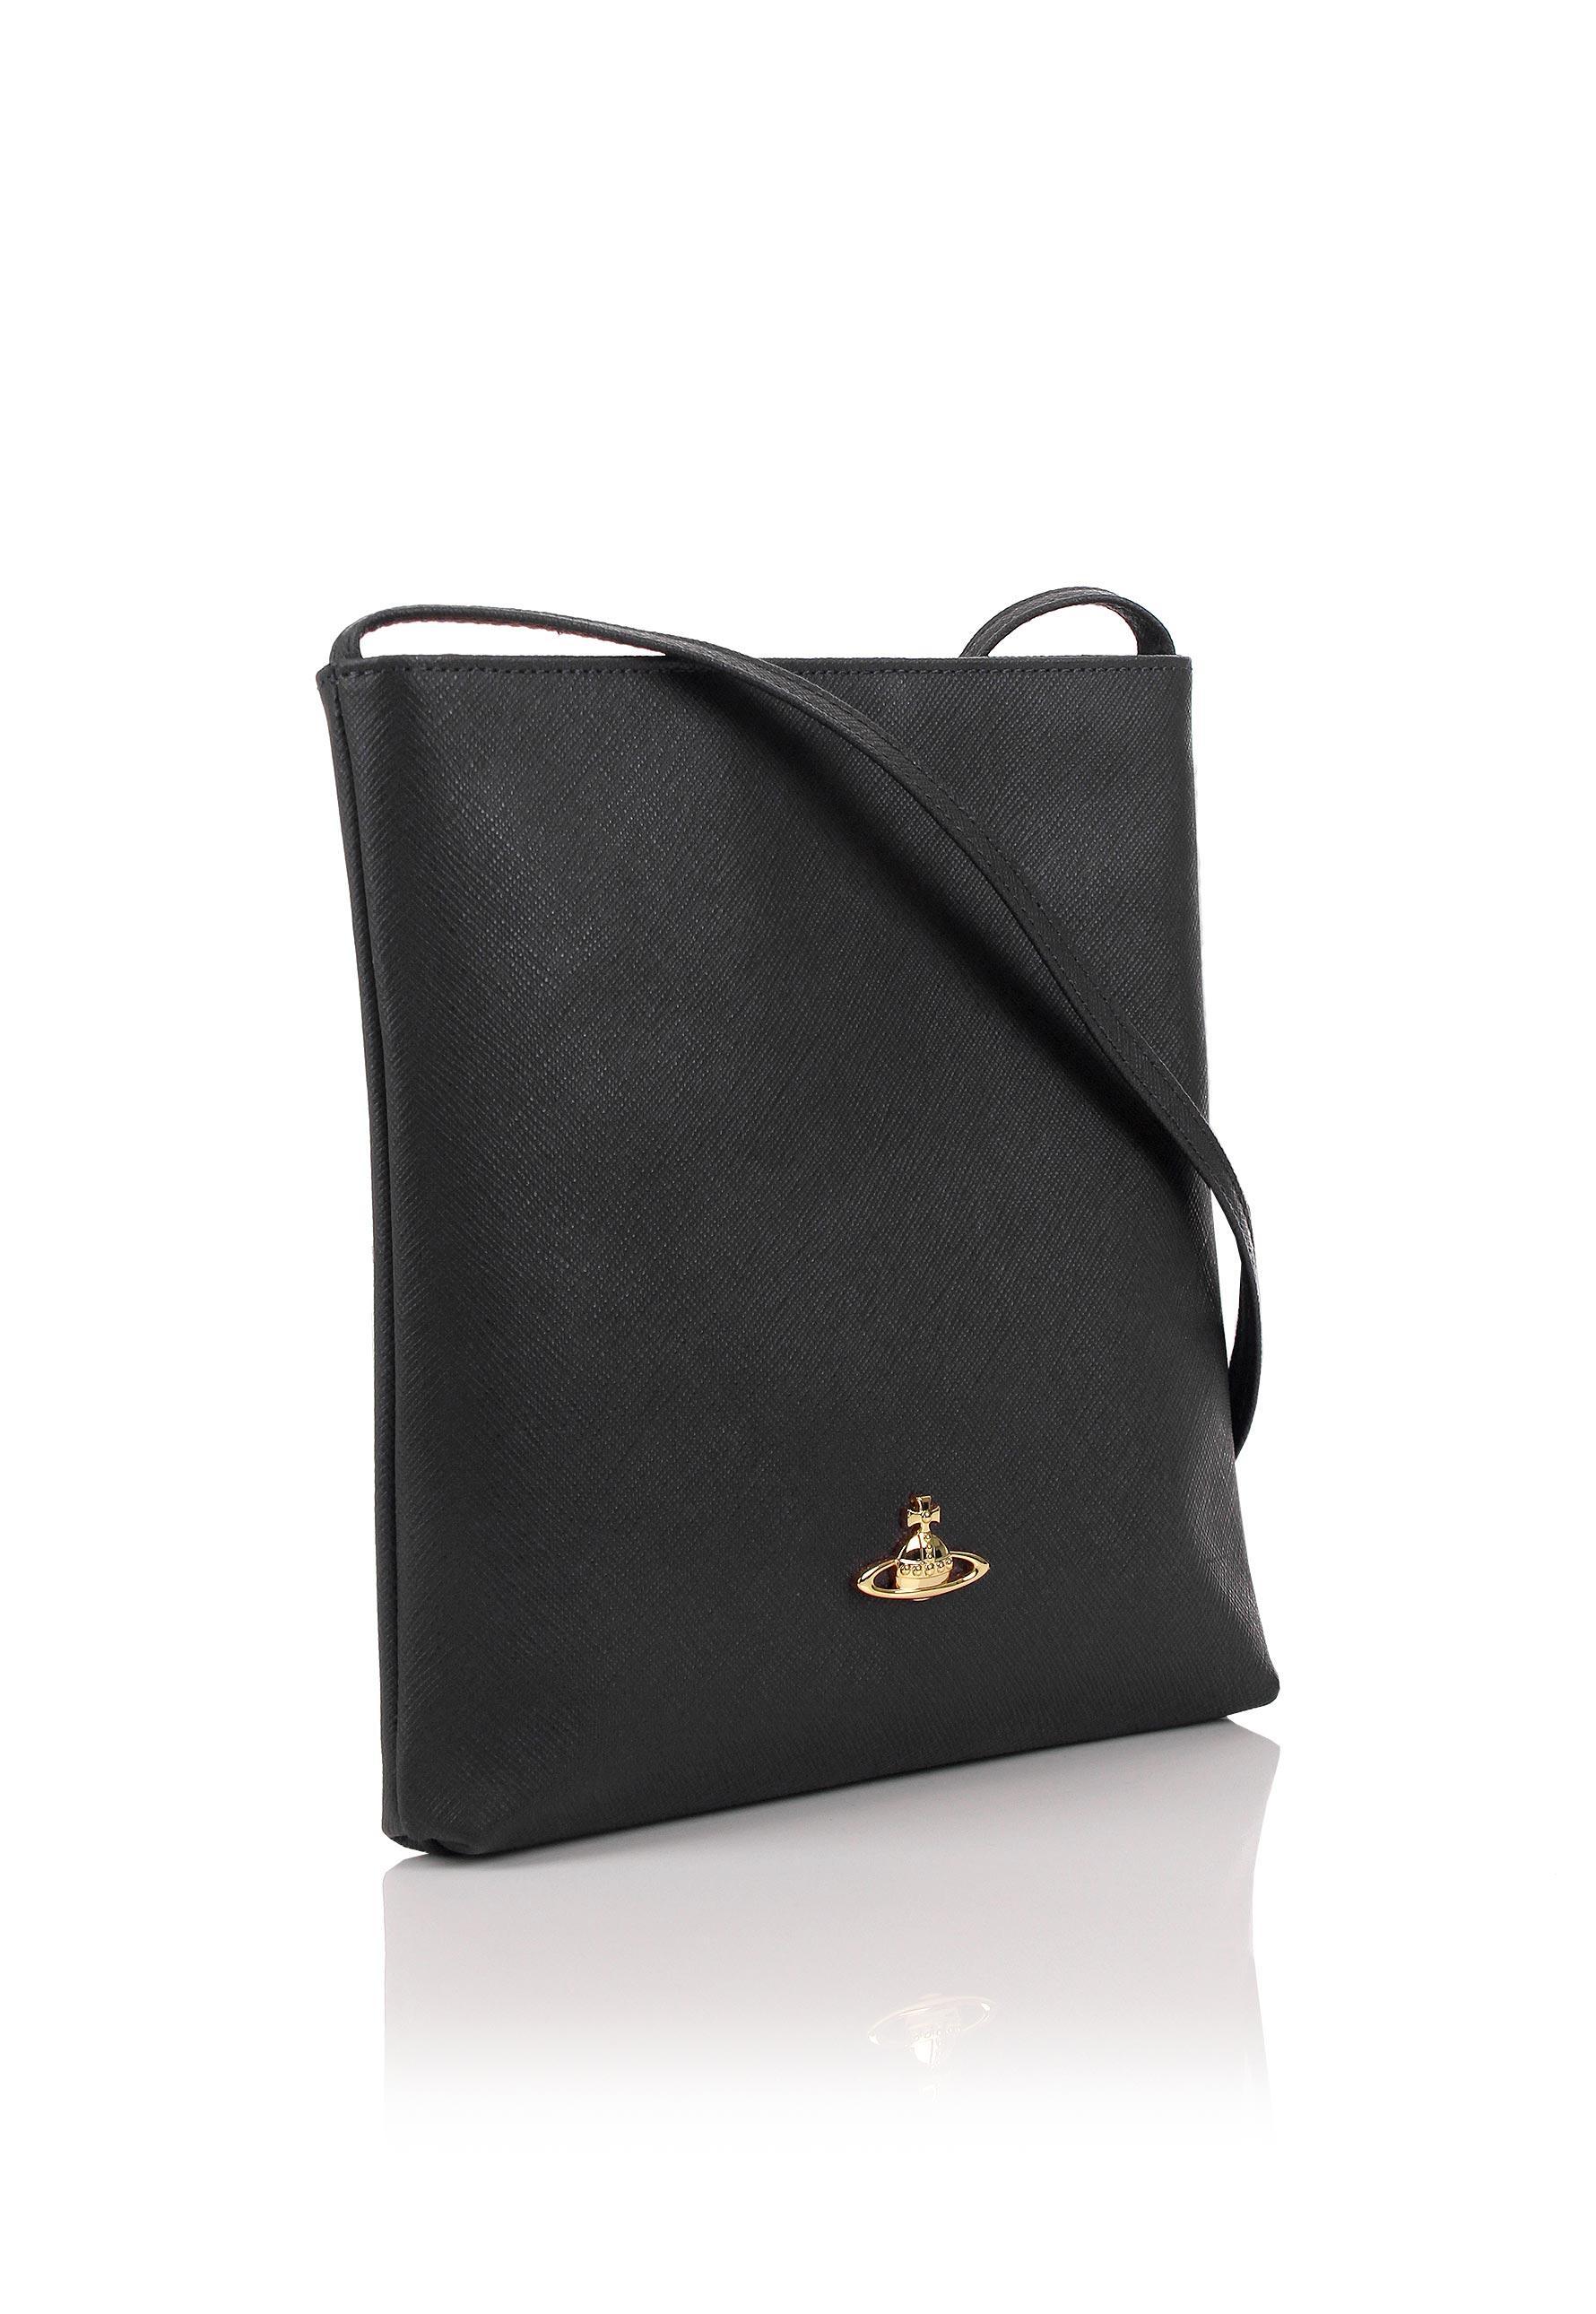 5e0d55b4c Vivienne Westwood Saffiano 6571 Small Crossbody Bag Black in Black ...